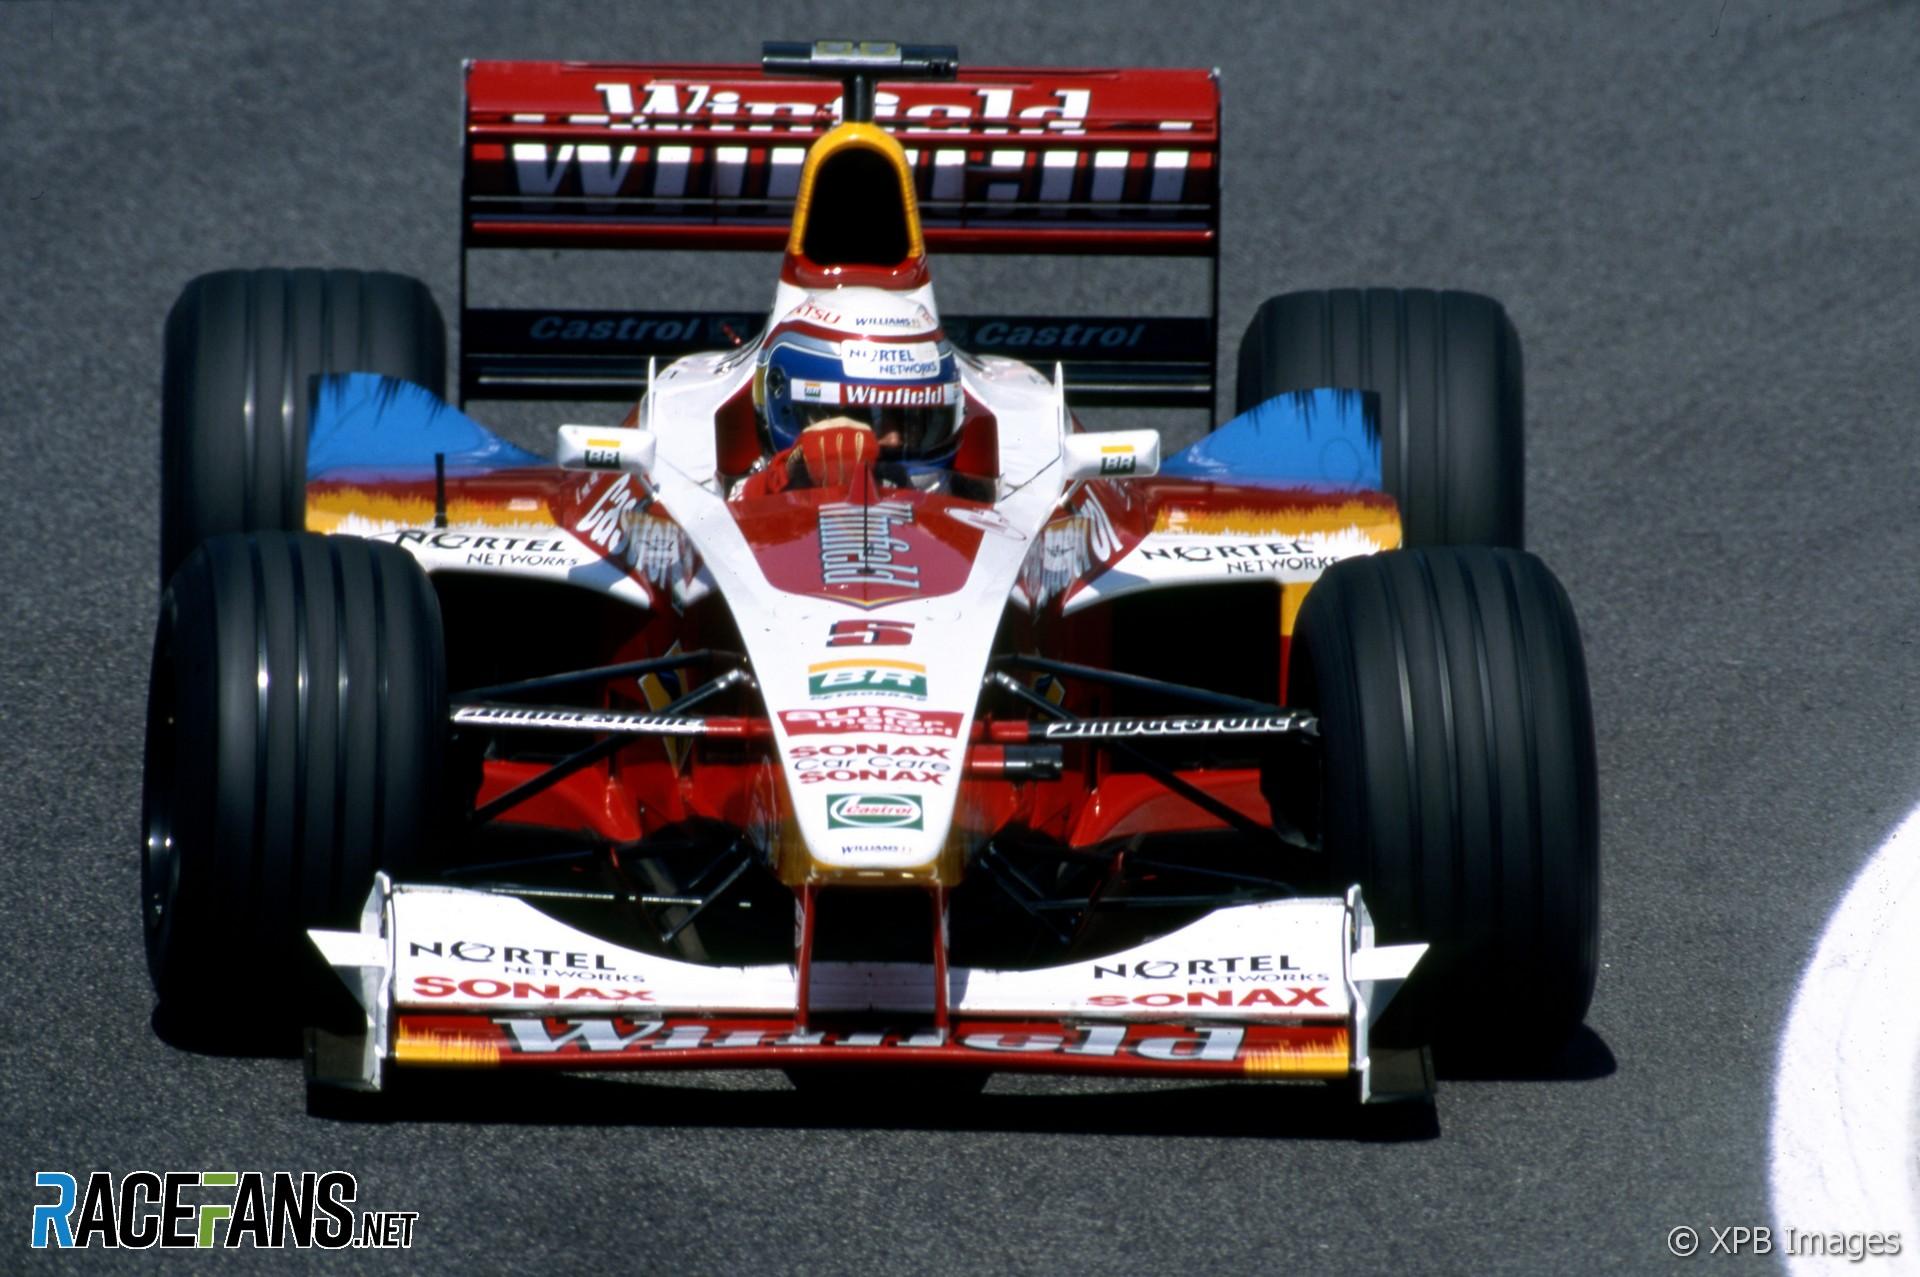 Alex Zanardi, Ganassi, Williams, Imola, 1999